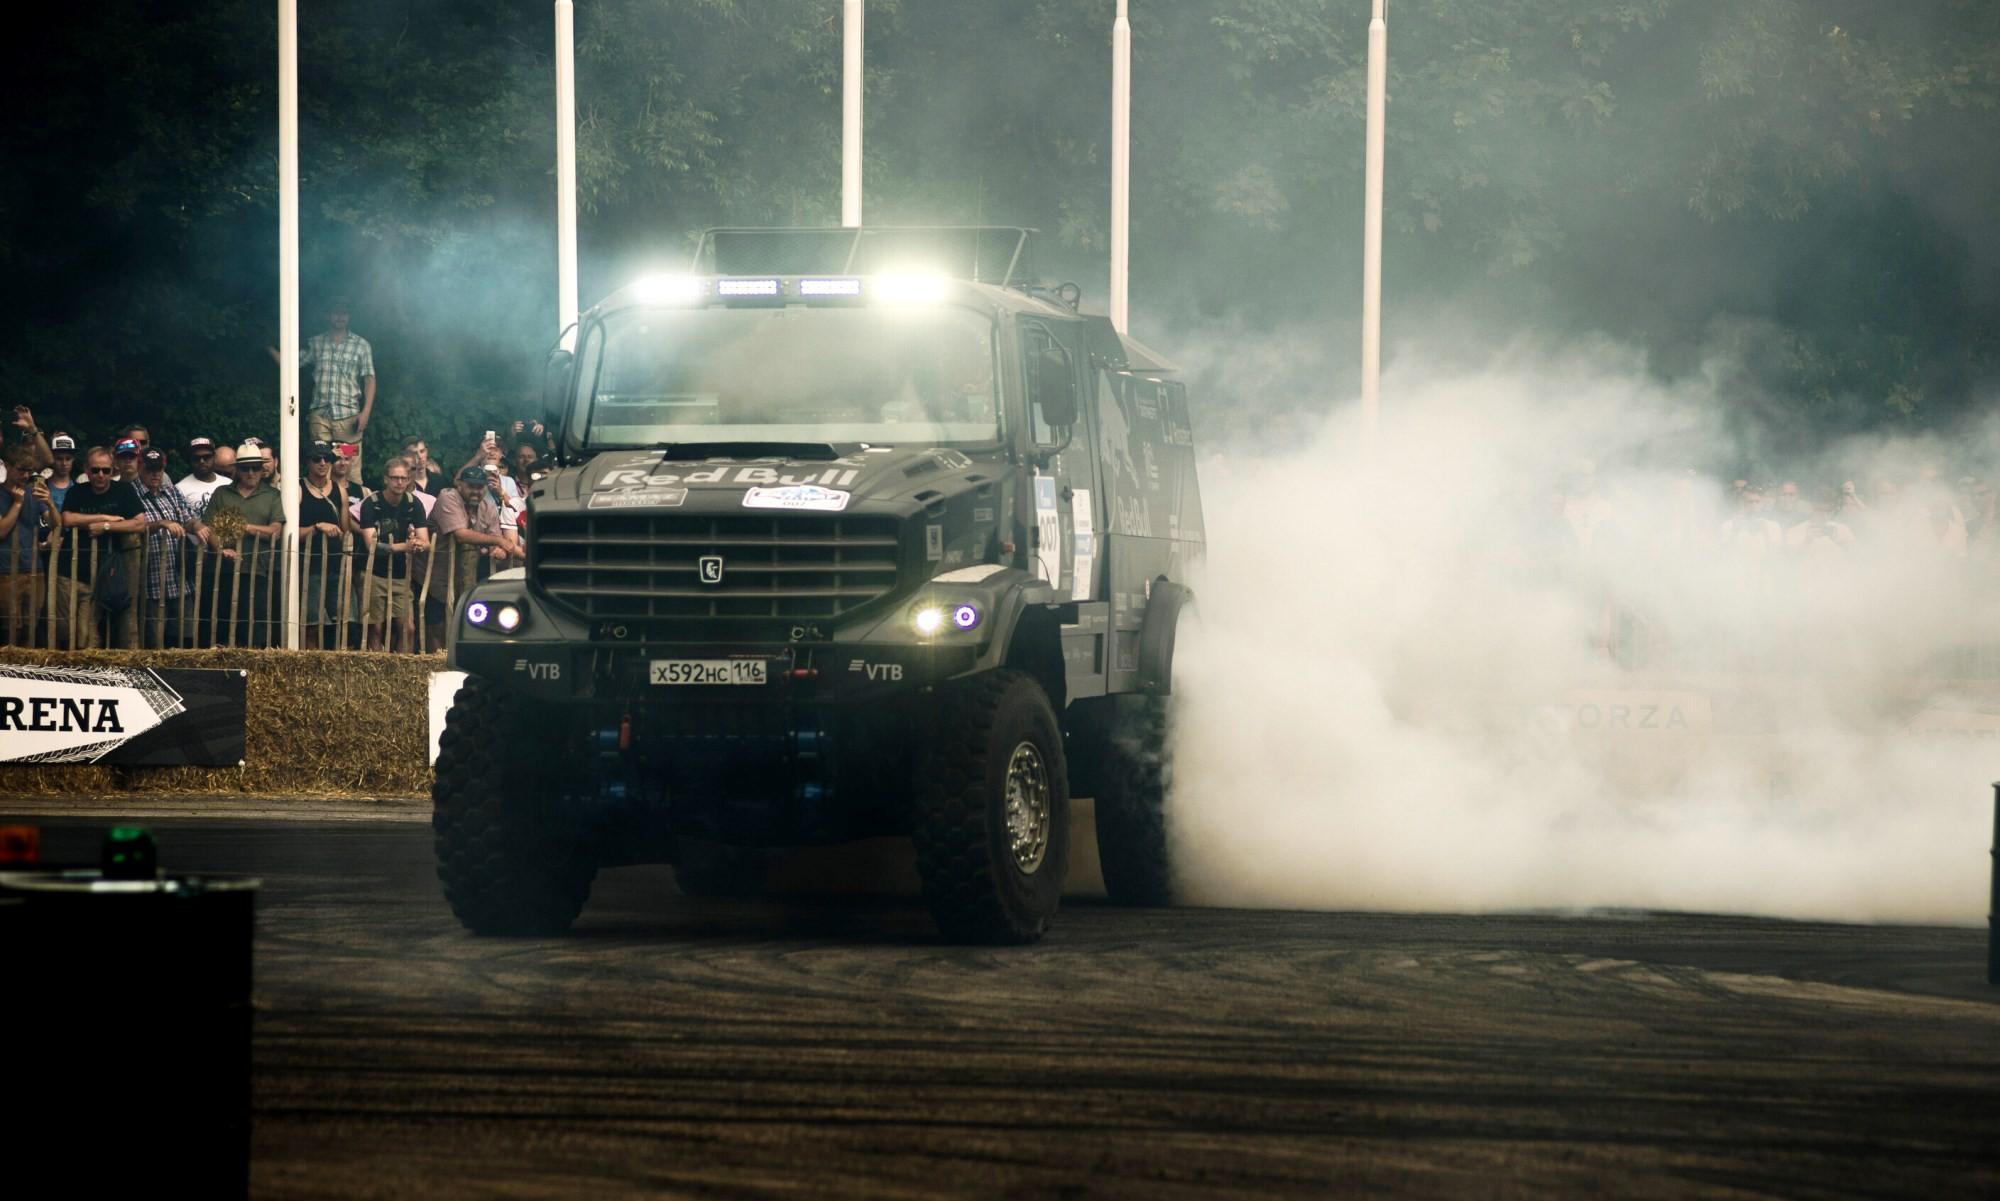 Eduard Nikolaev and the Kamaz truck drift through The Arena at 2019 Goodwood Festival Of Speed